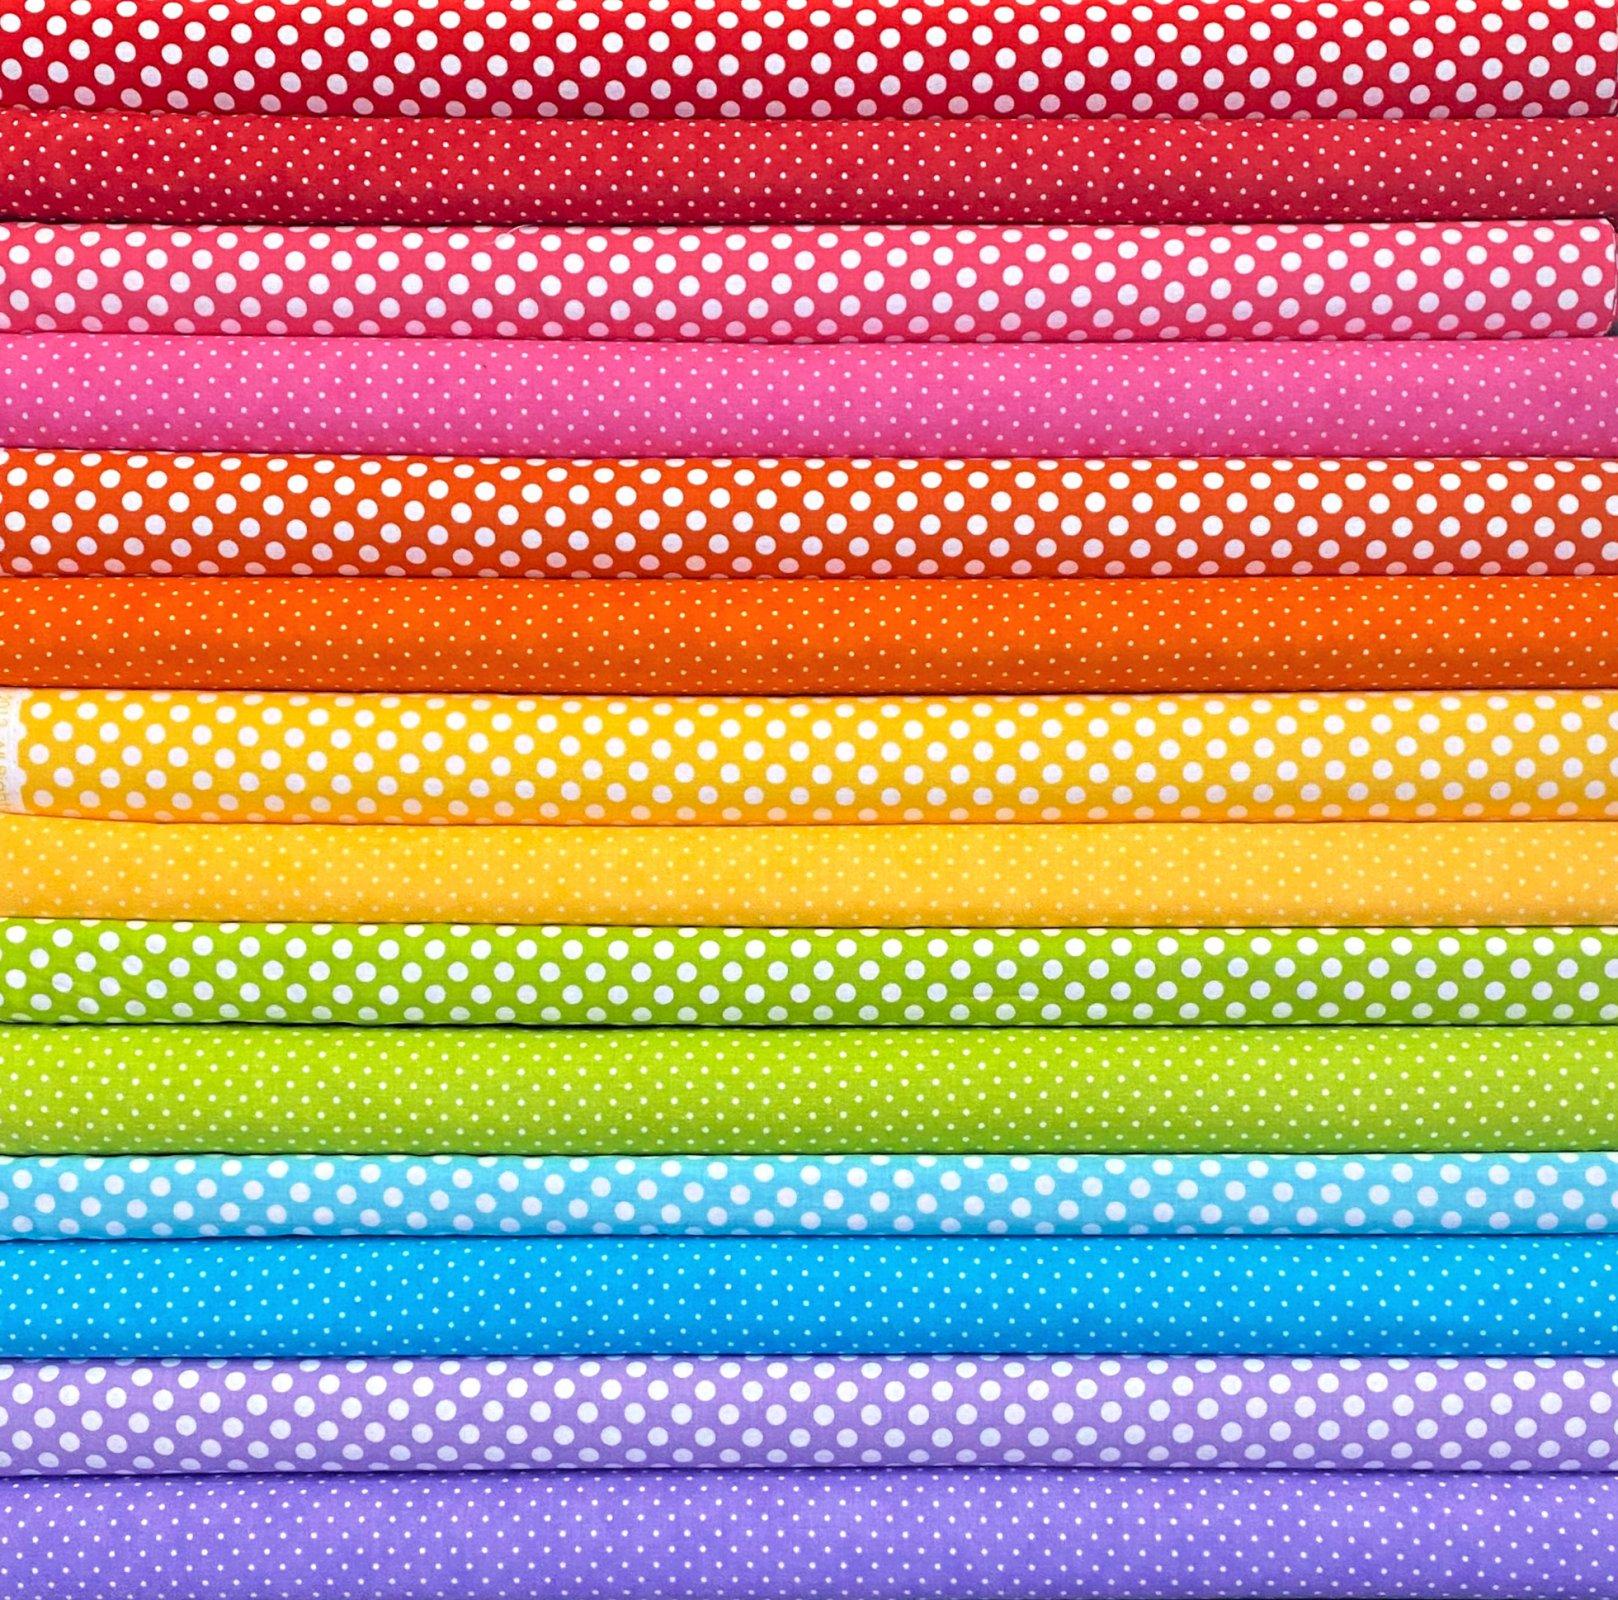 Rainbow Dots Fat Quarters - 14 FQ's